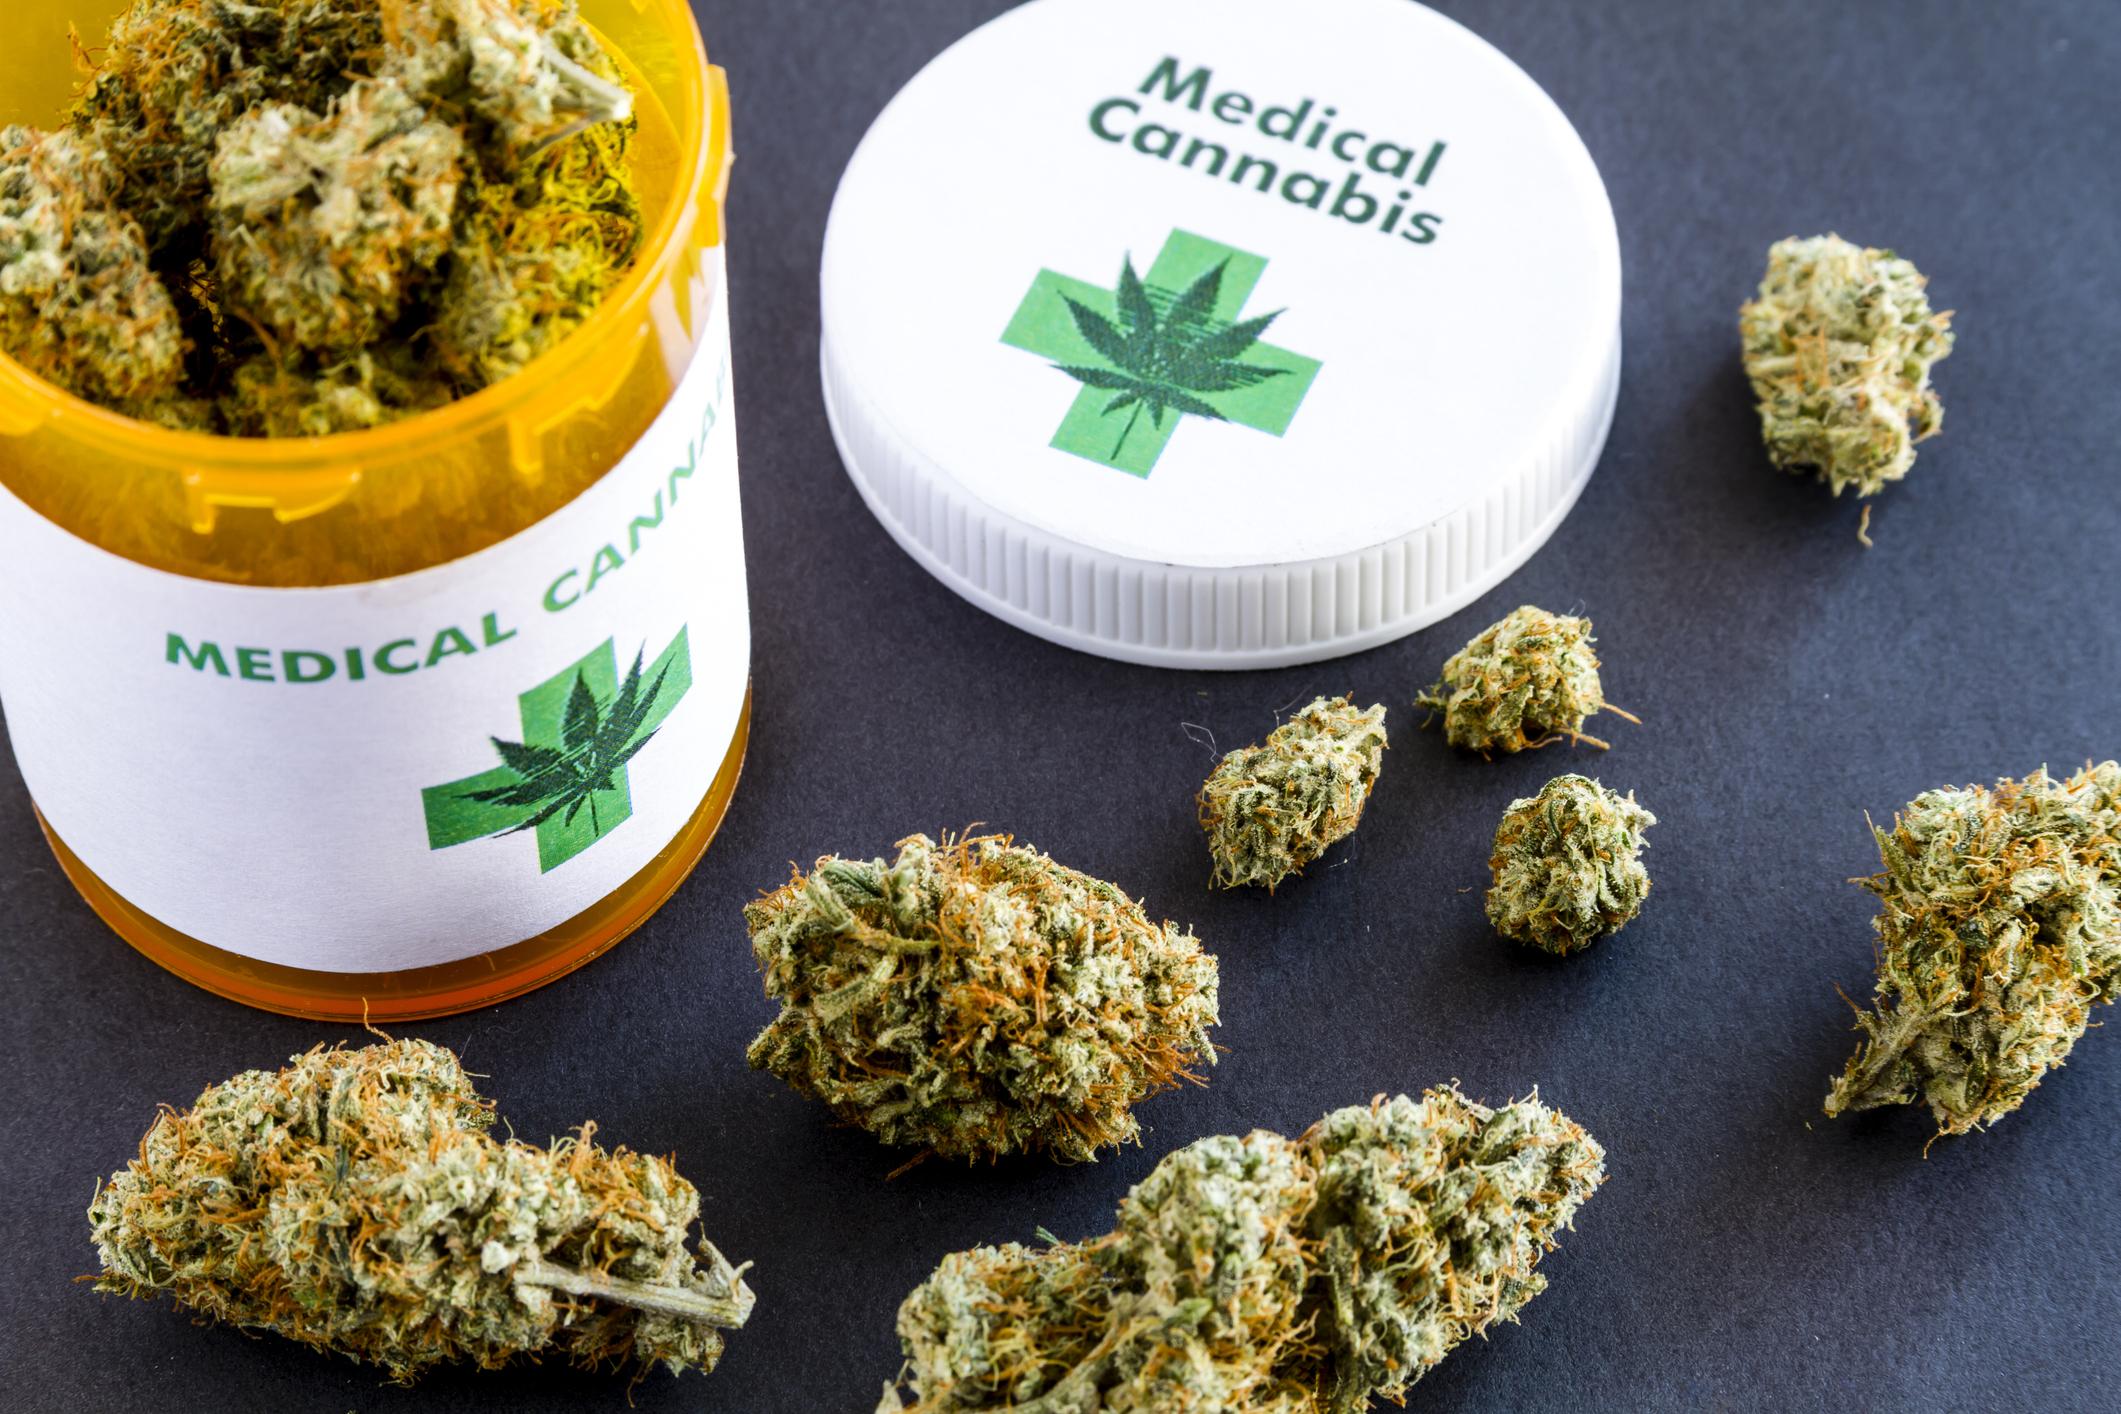 Marjuana buds resting on a desk next to an open prescription bottle.